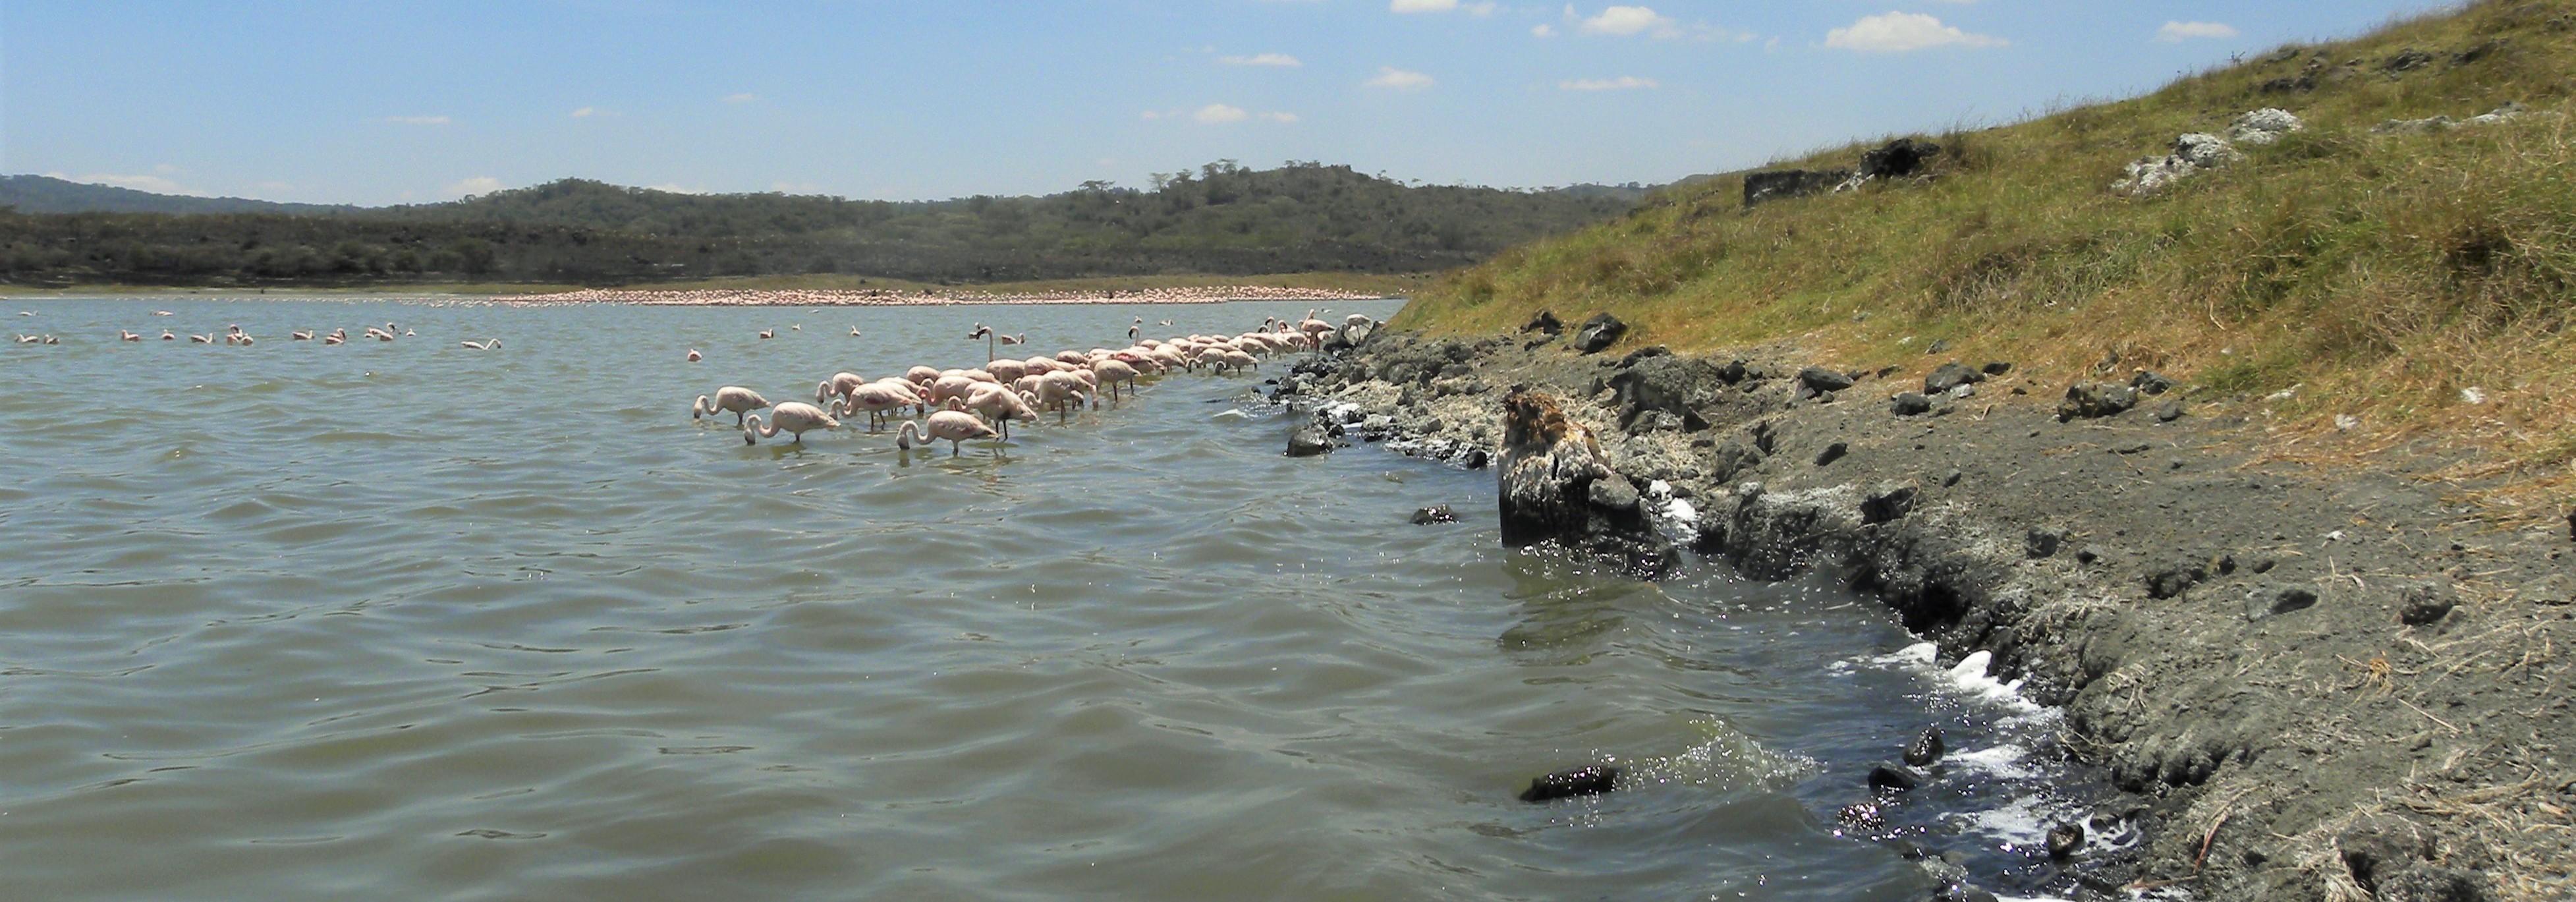 Arusha National Park-Lake Momela